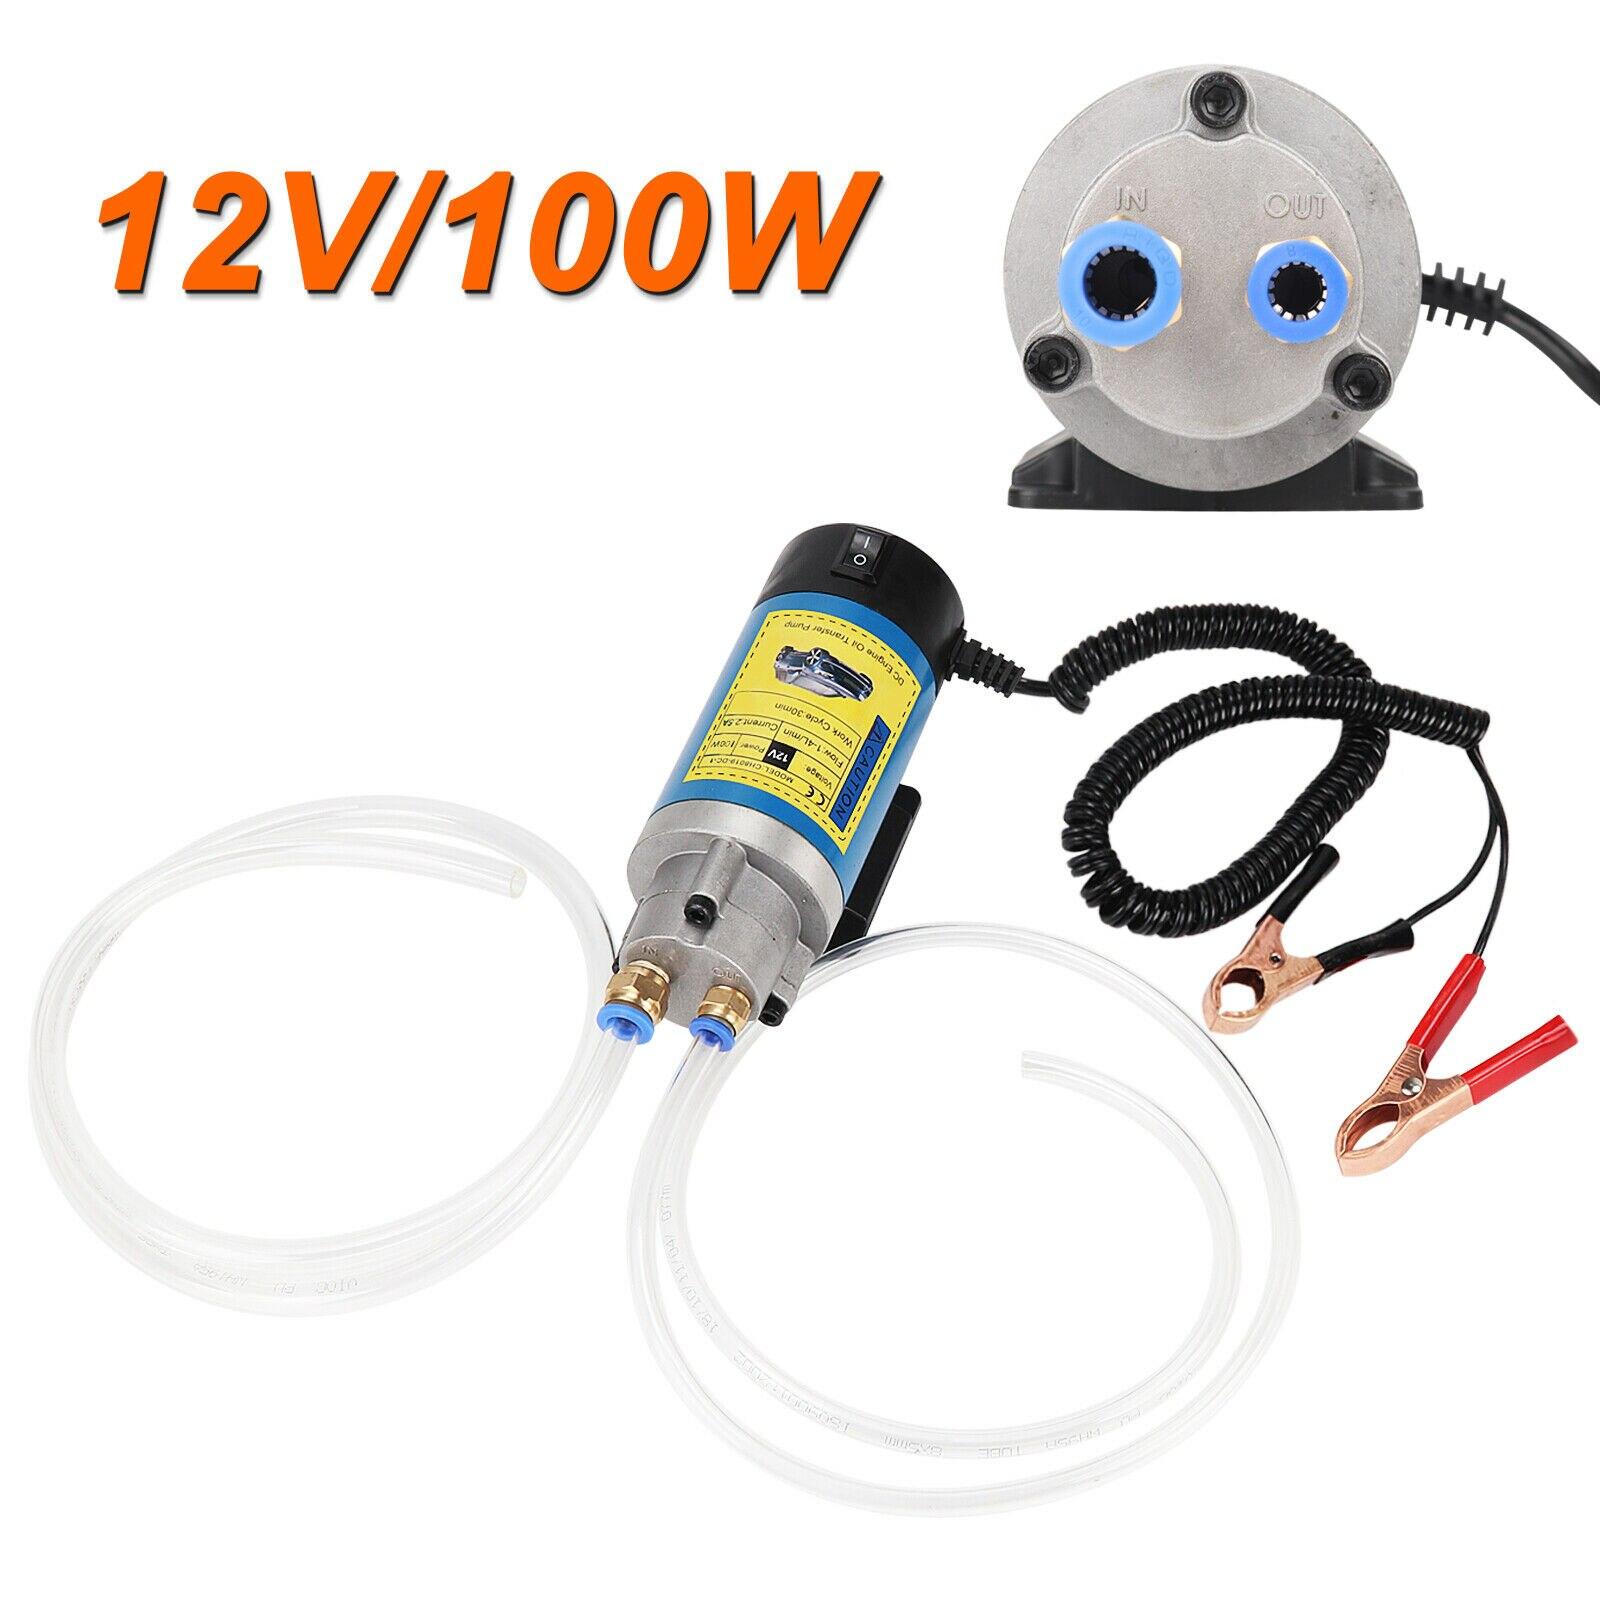 100 W 12 V חשמלי שמן העברת Extractor נוזל דיזל משאבת סיפון רכב אופנוע